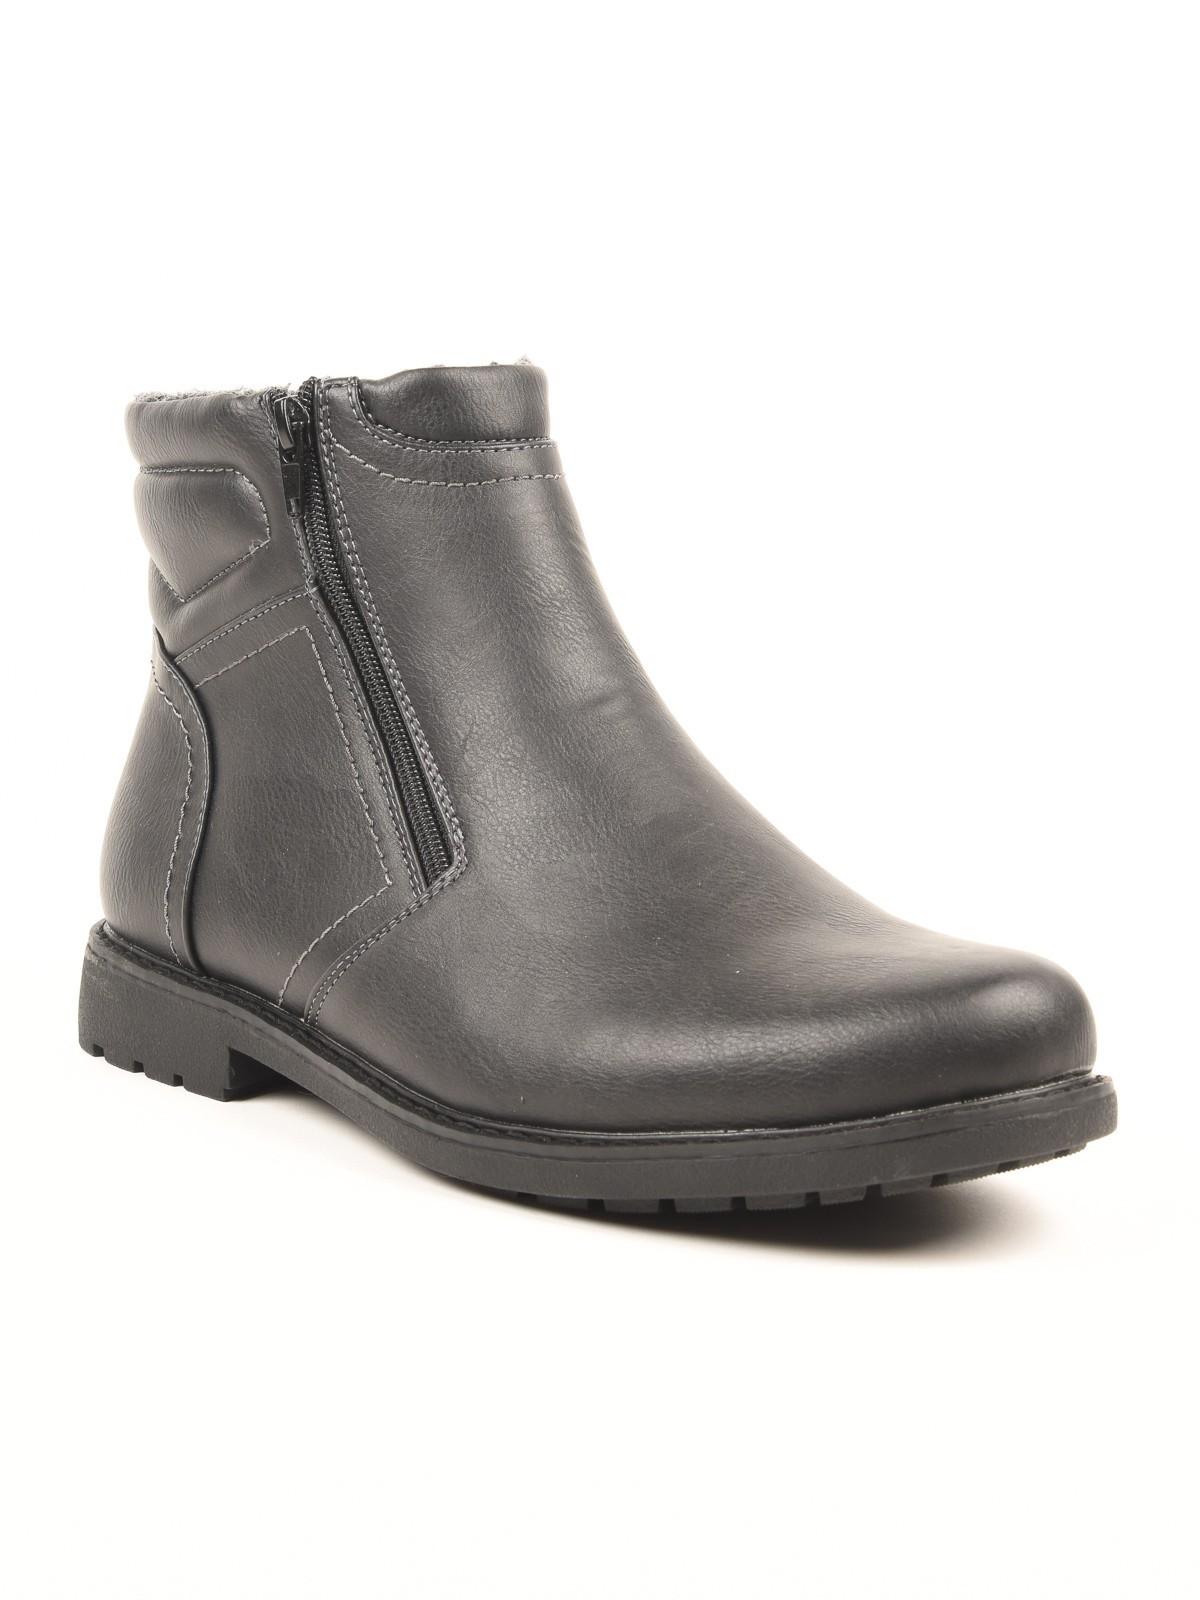 boots double fermetures homme noir districenter. Black Bedroom Furniture Sets. Home Design Ideas